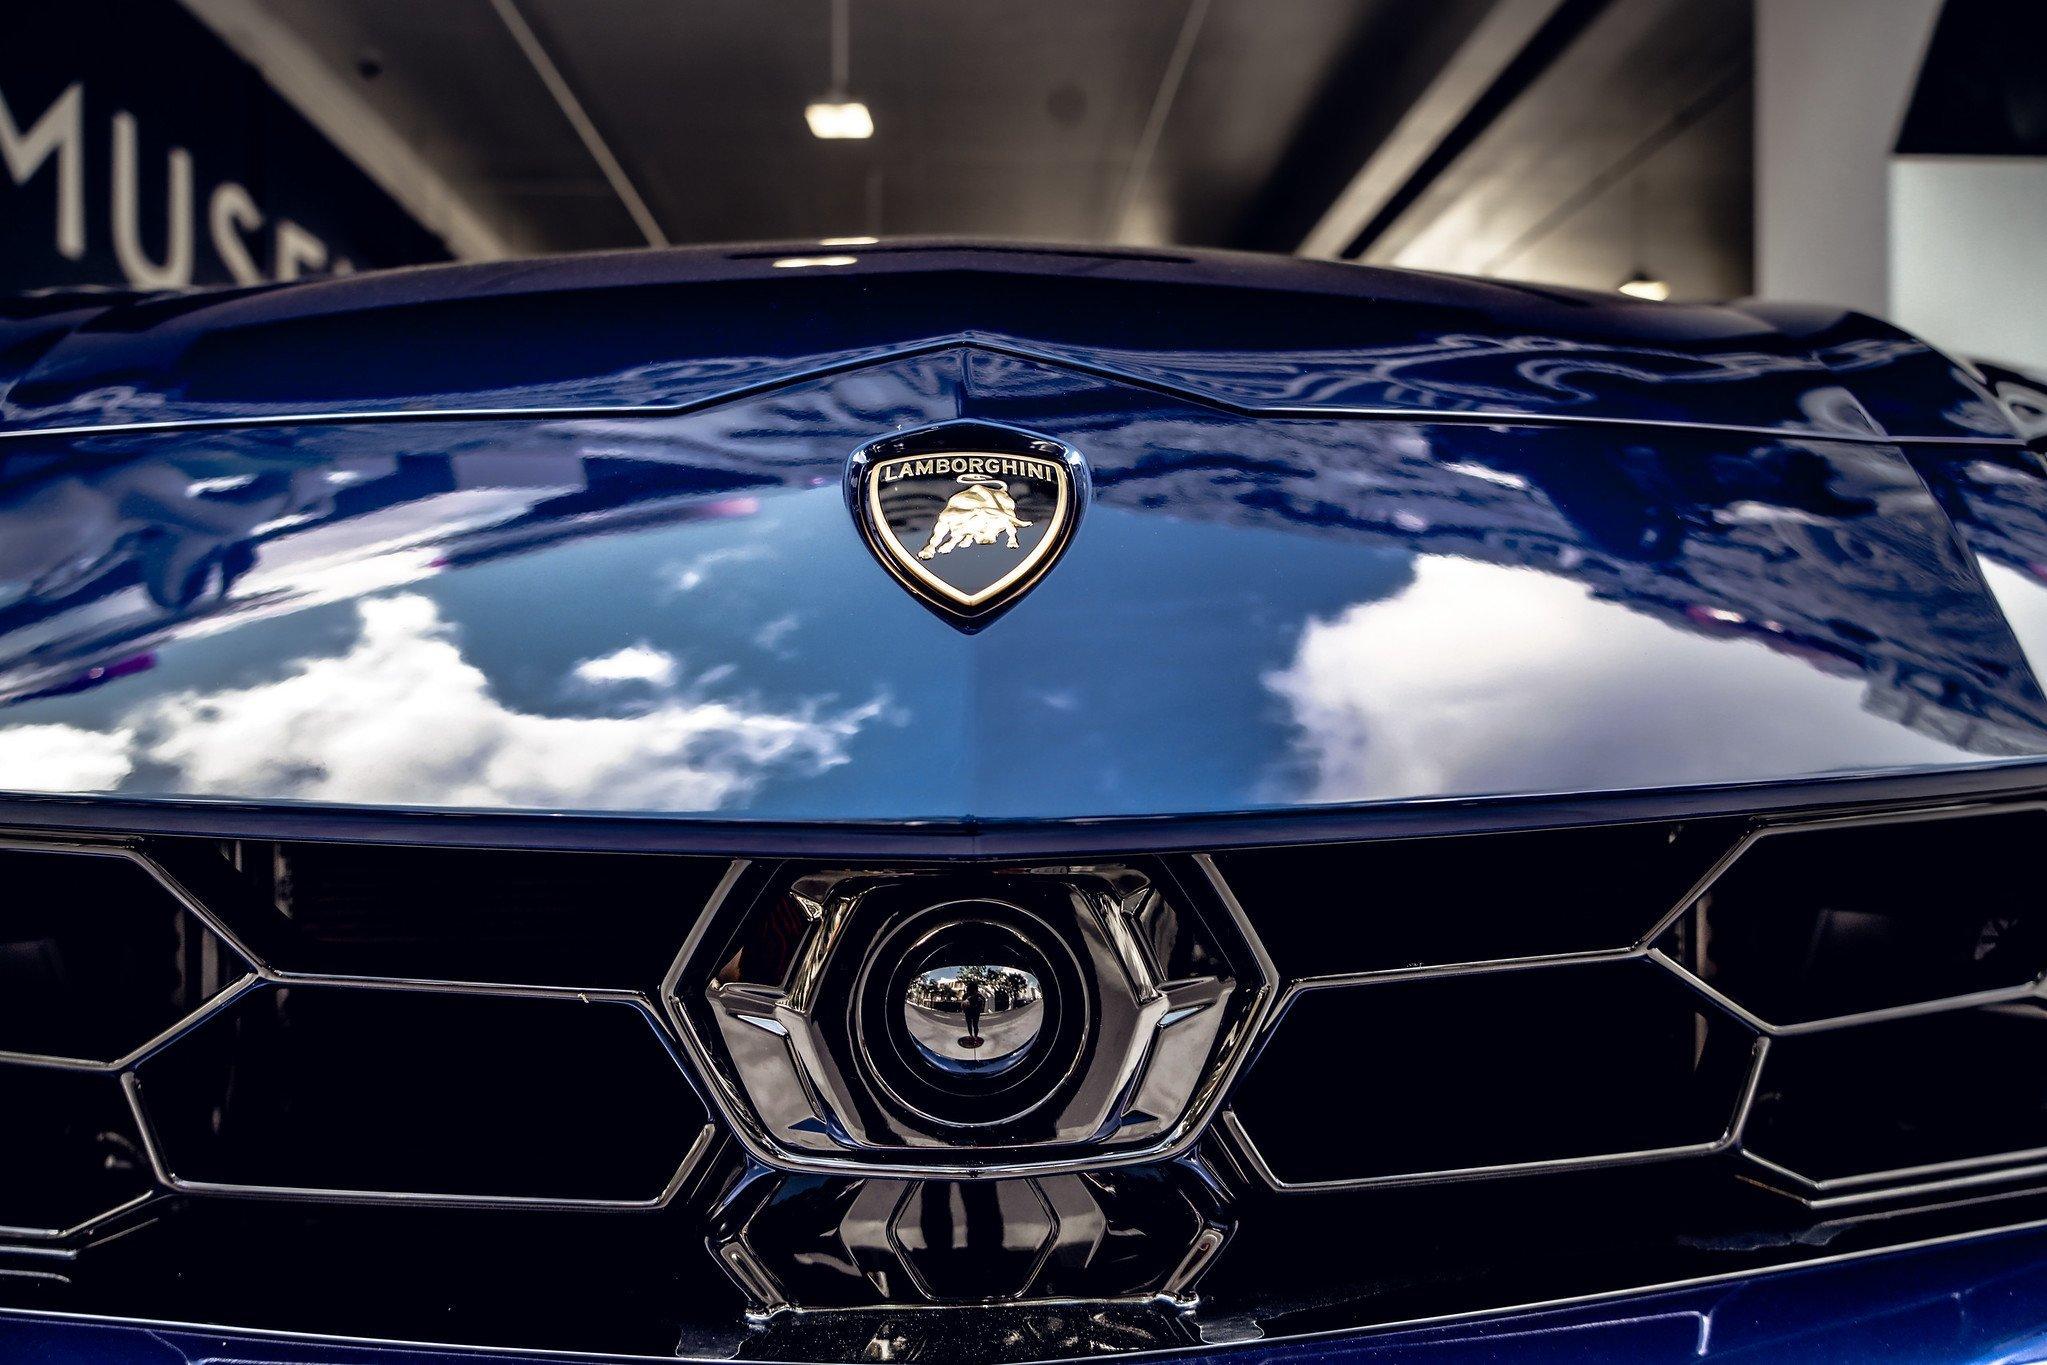 Image #14 of our  2021 Lamborghini Urus - Dark Blue    In Miami Fort Lauderdale Palm Beach South Florida